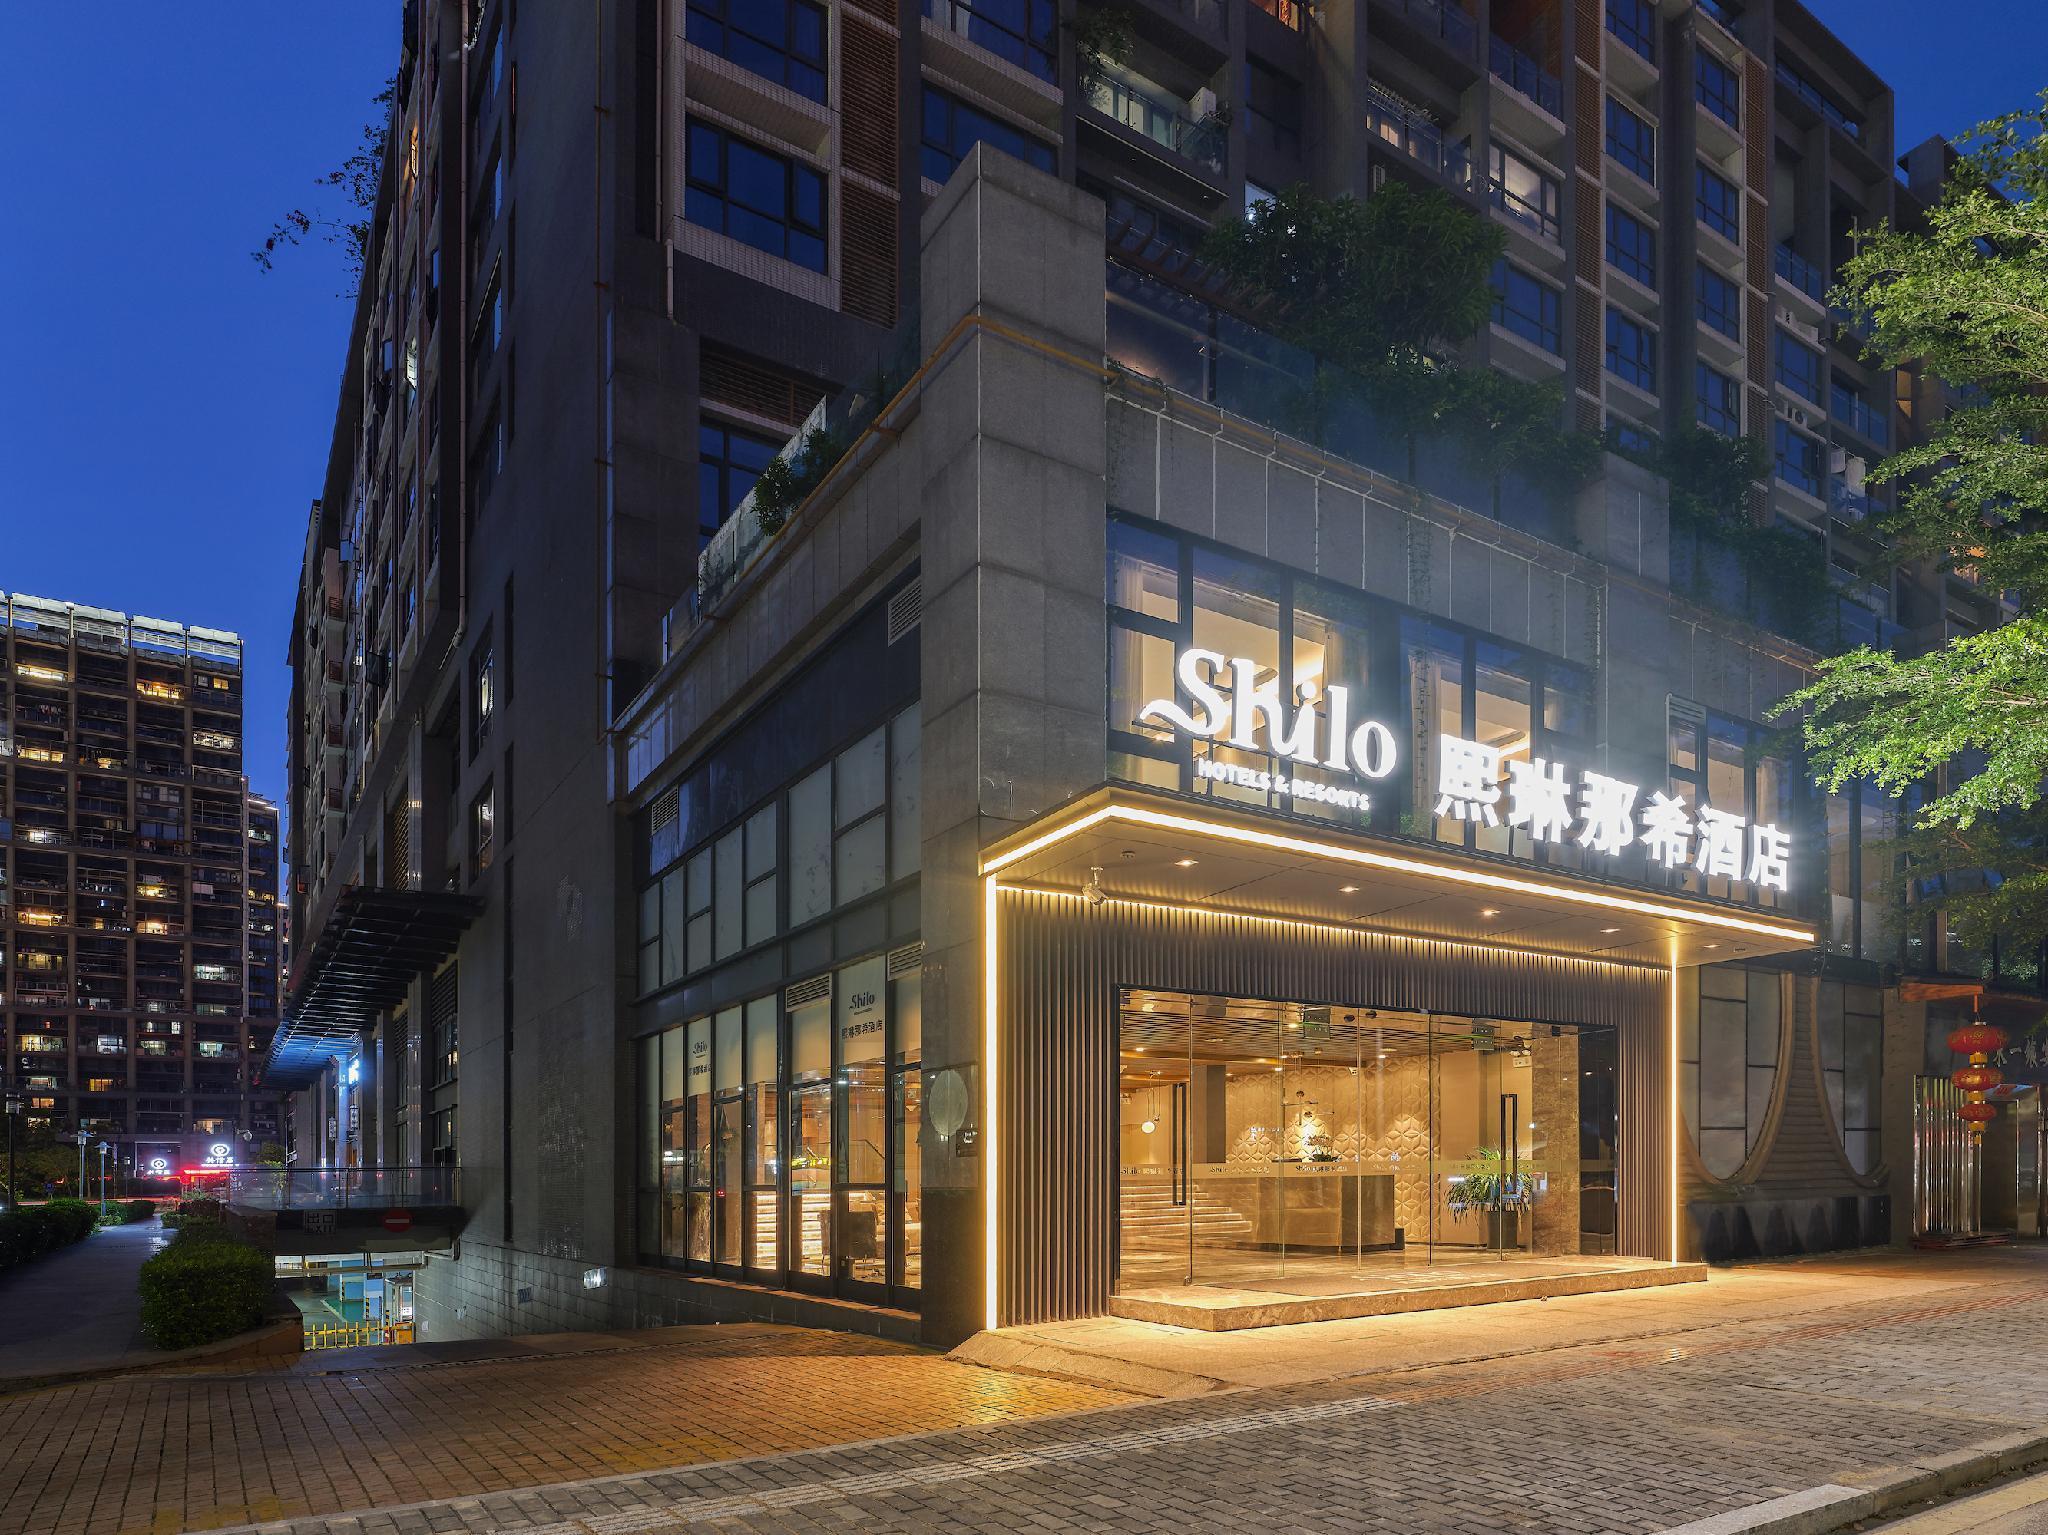 Shilo Naci Hotel